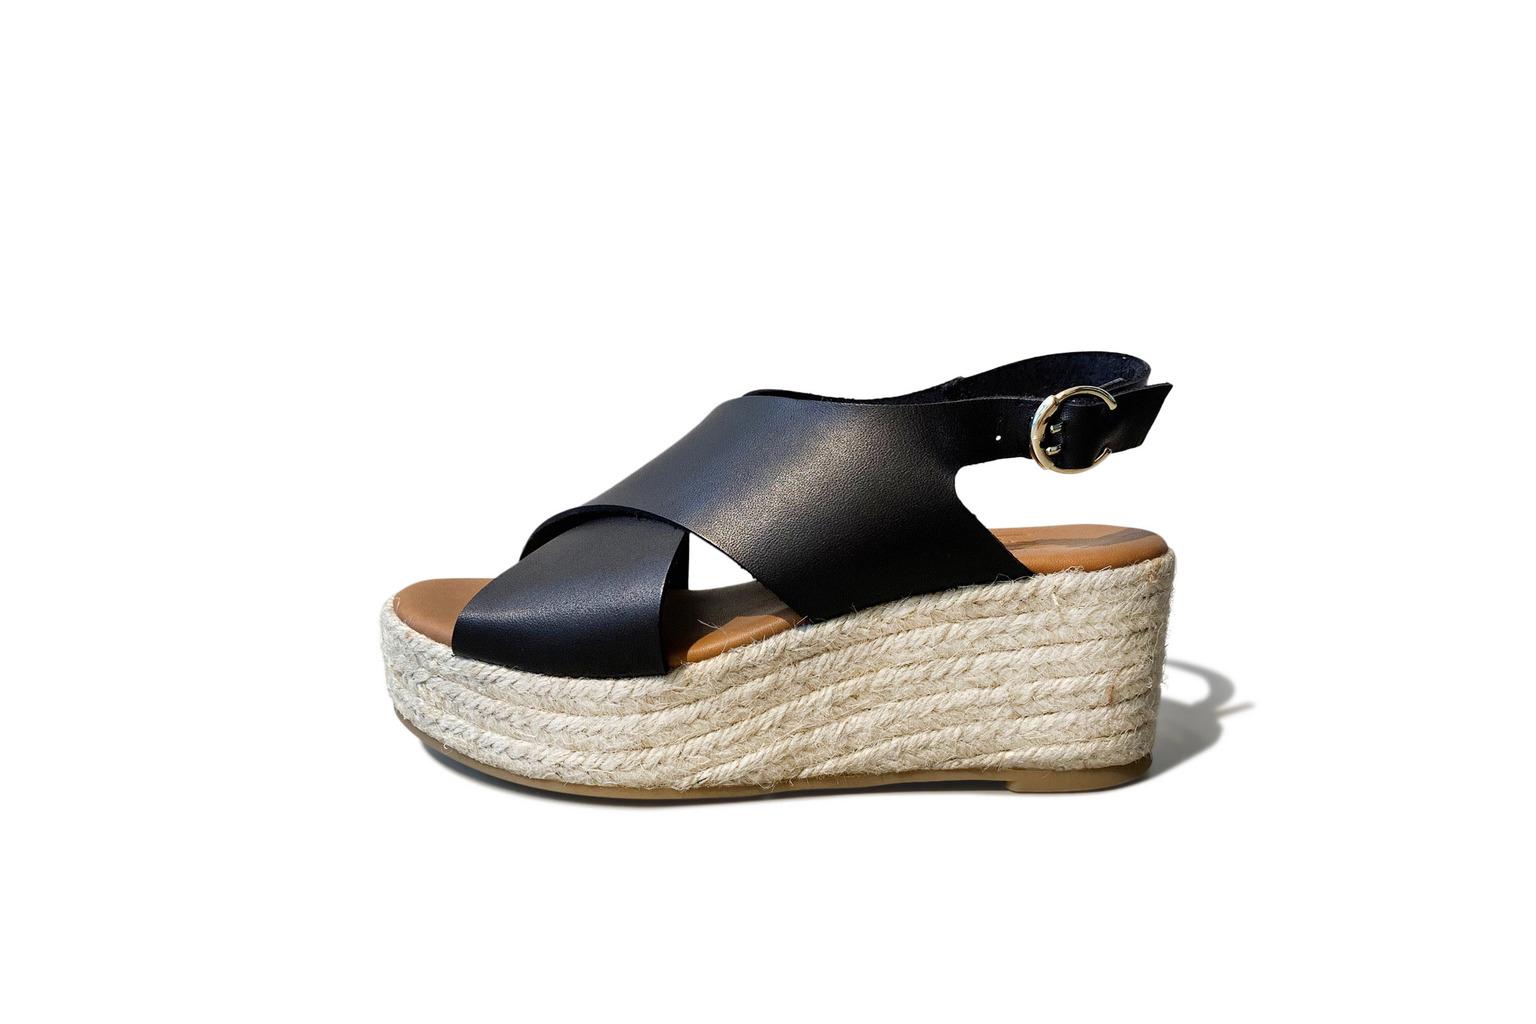 Billi Bi 2676 sandal